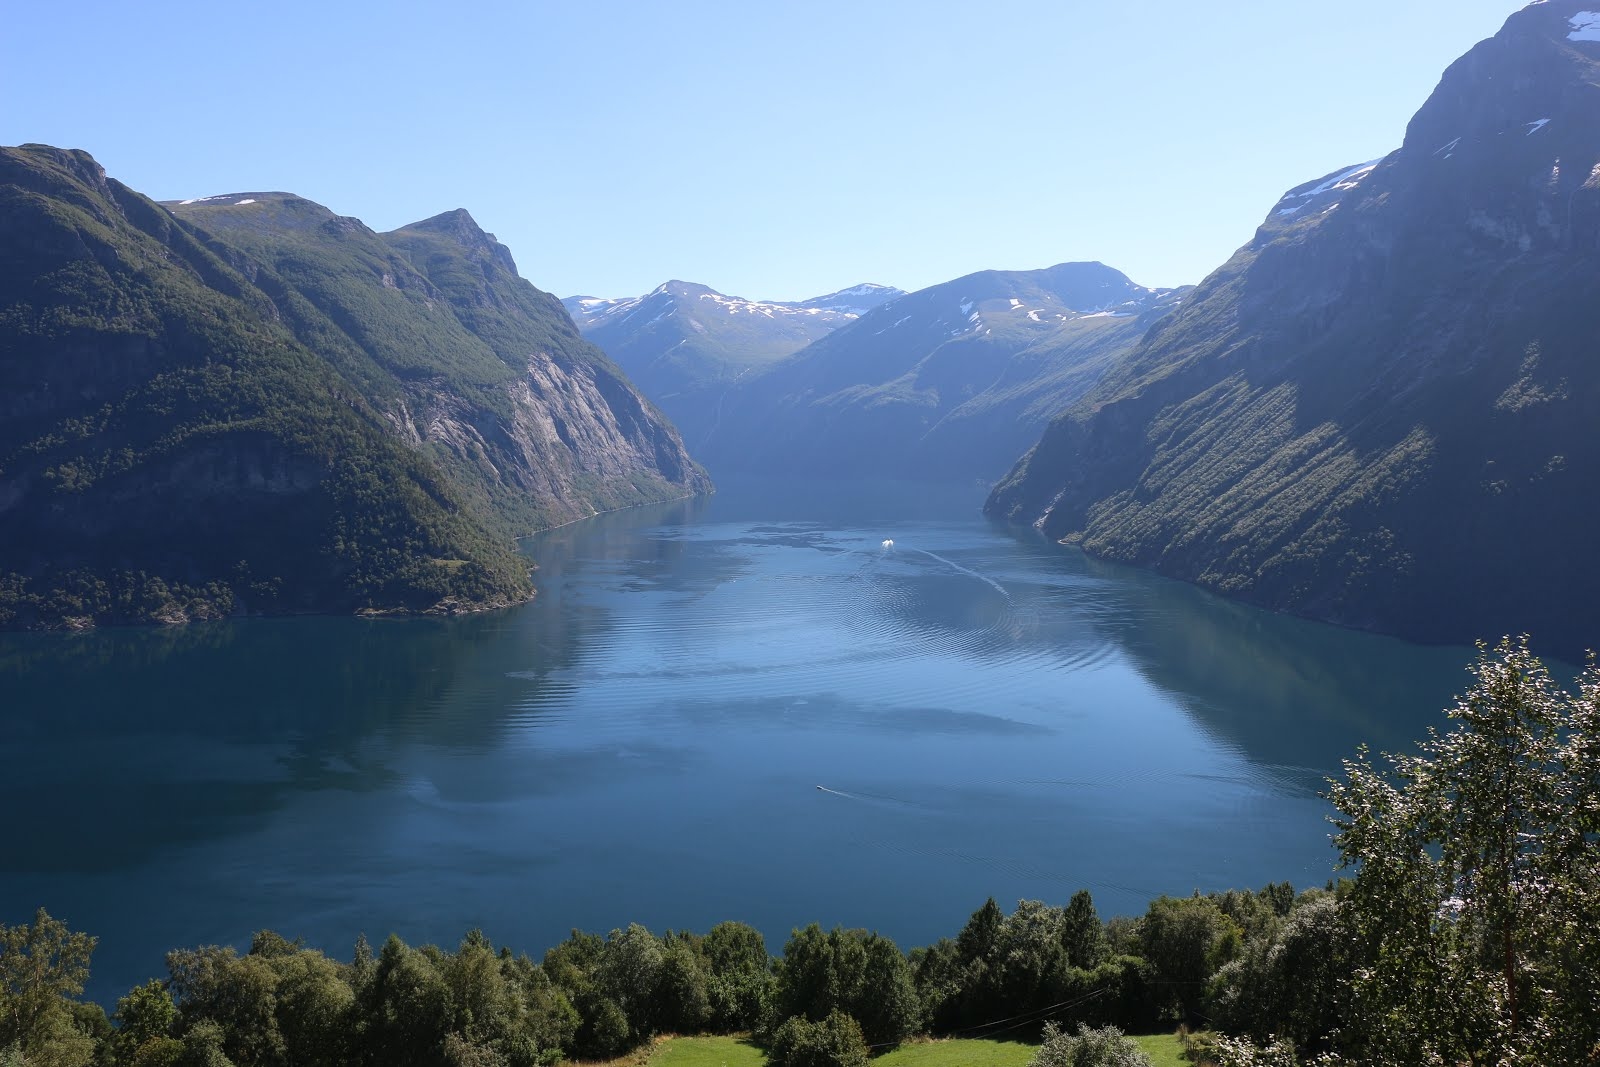 JEG ELSKER NORGE czyli kocham Norwegię